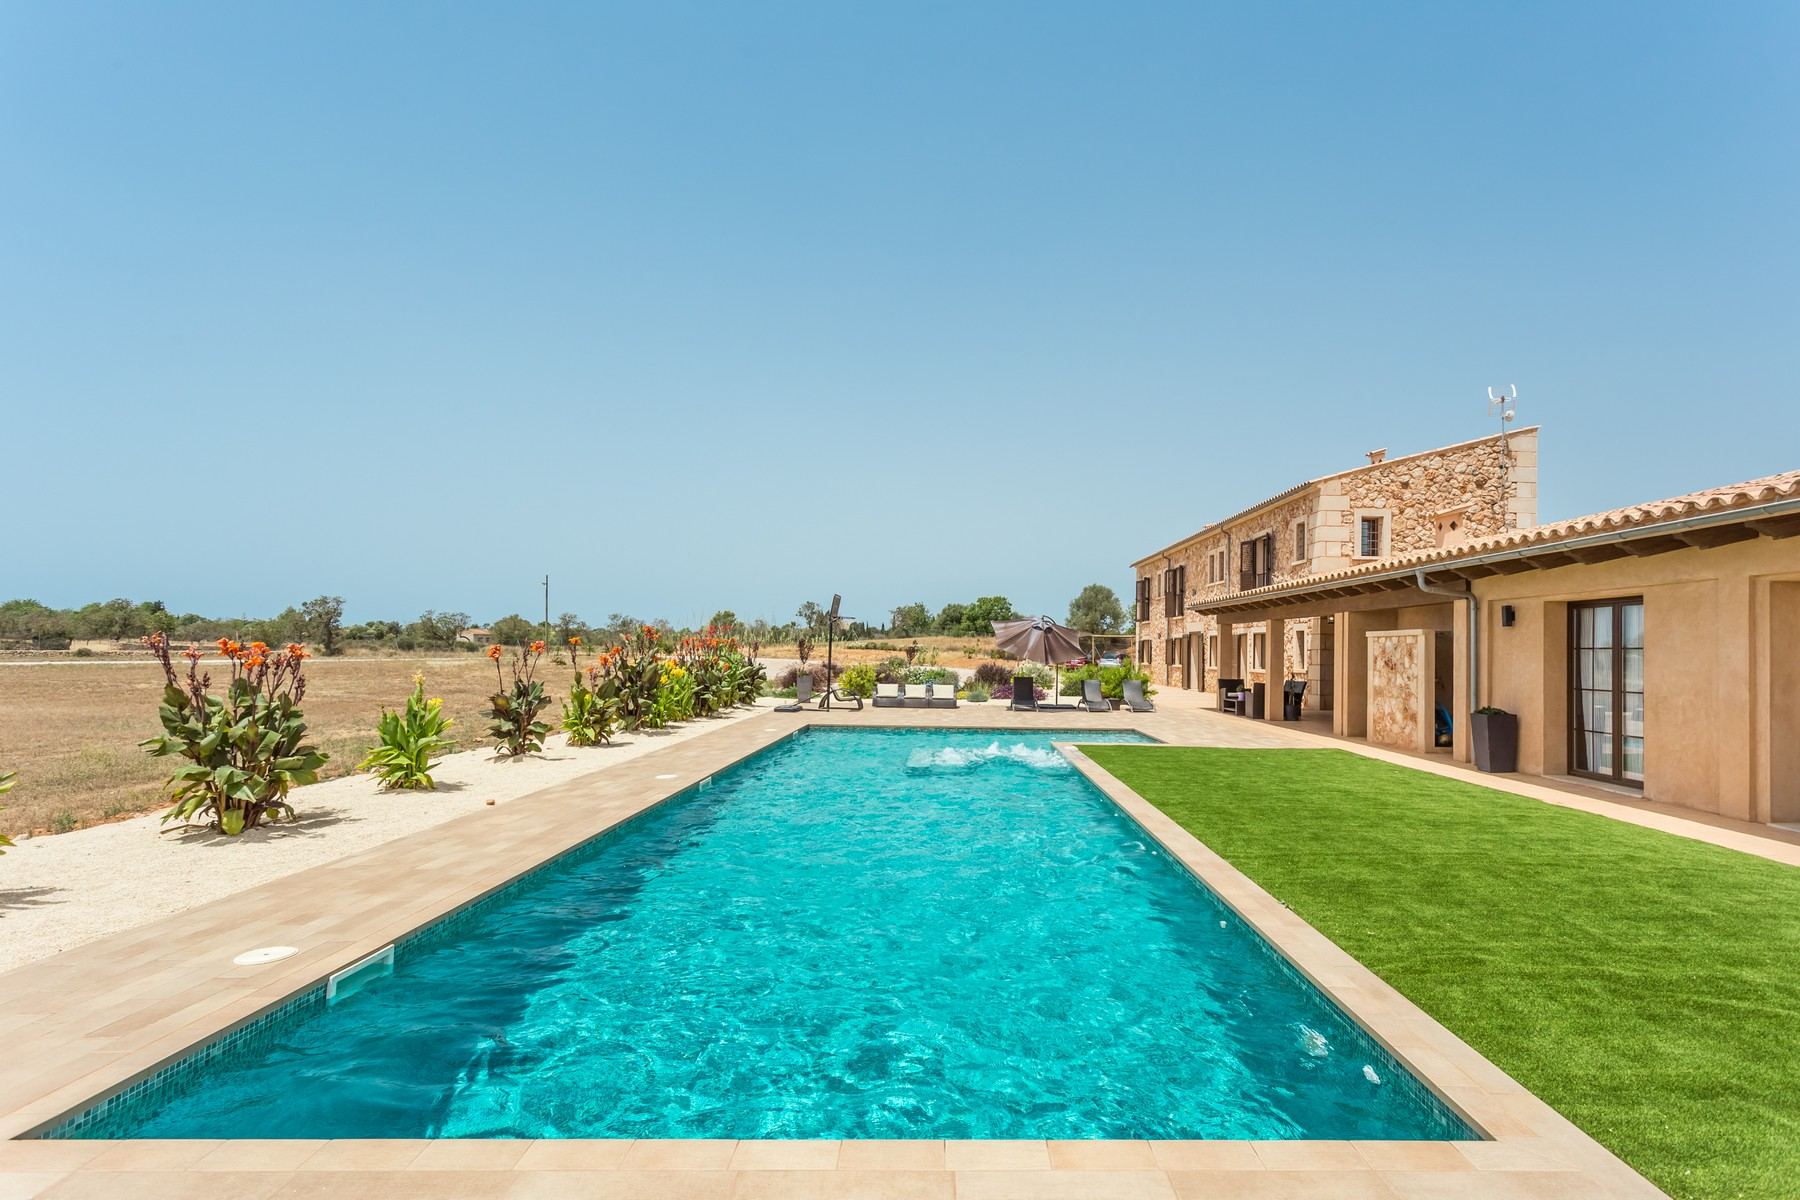 Casa Unifamiliar por un Venta en Country Estate with panoramic views in Llucmajor Other Balearic Islands, Balearic Islands, 07000 España